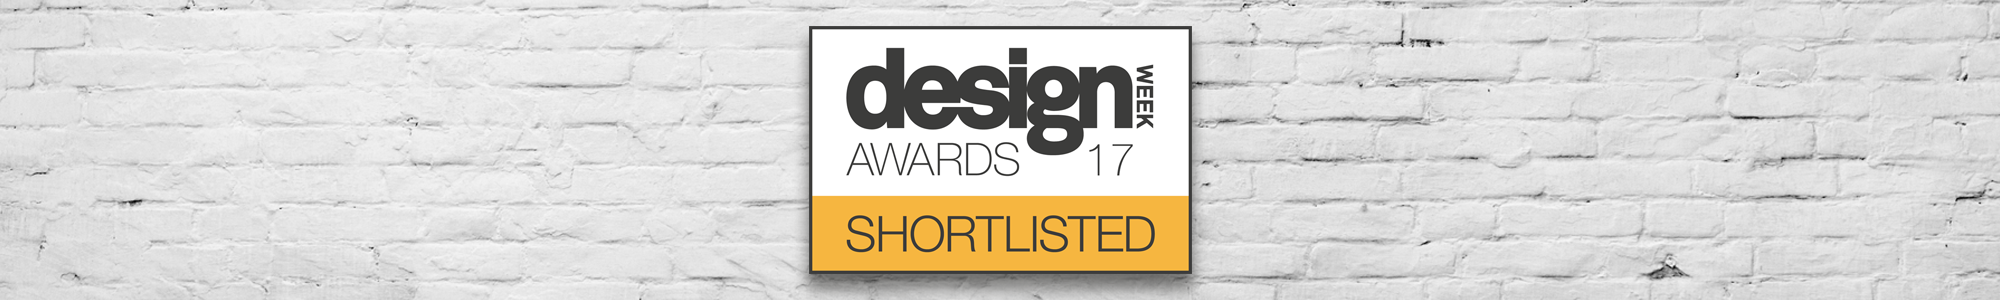 2000x700px-design-week-awards.png